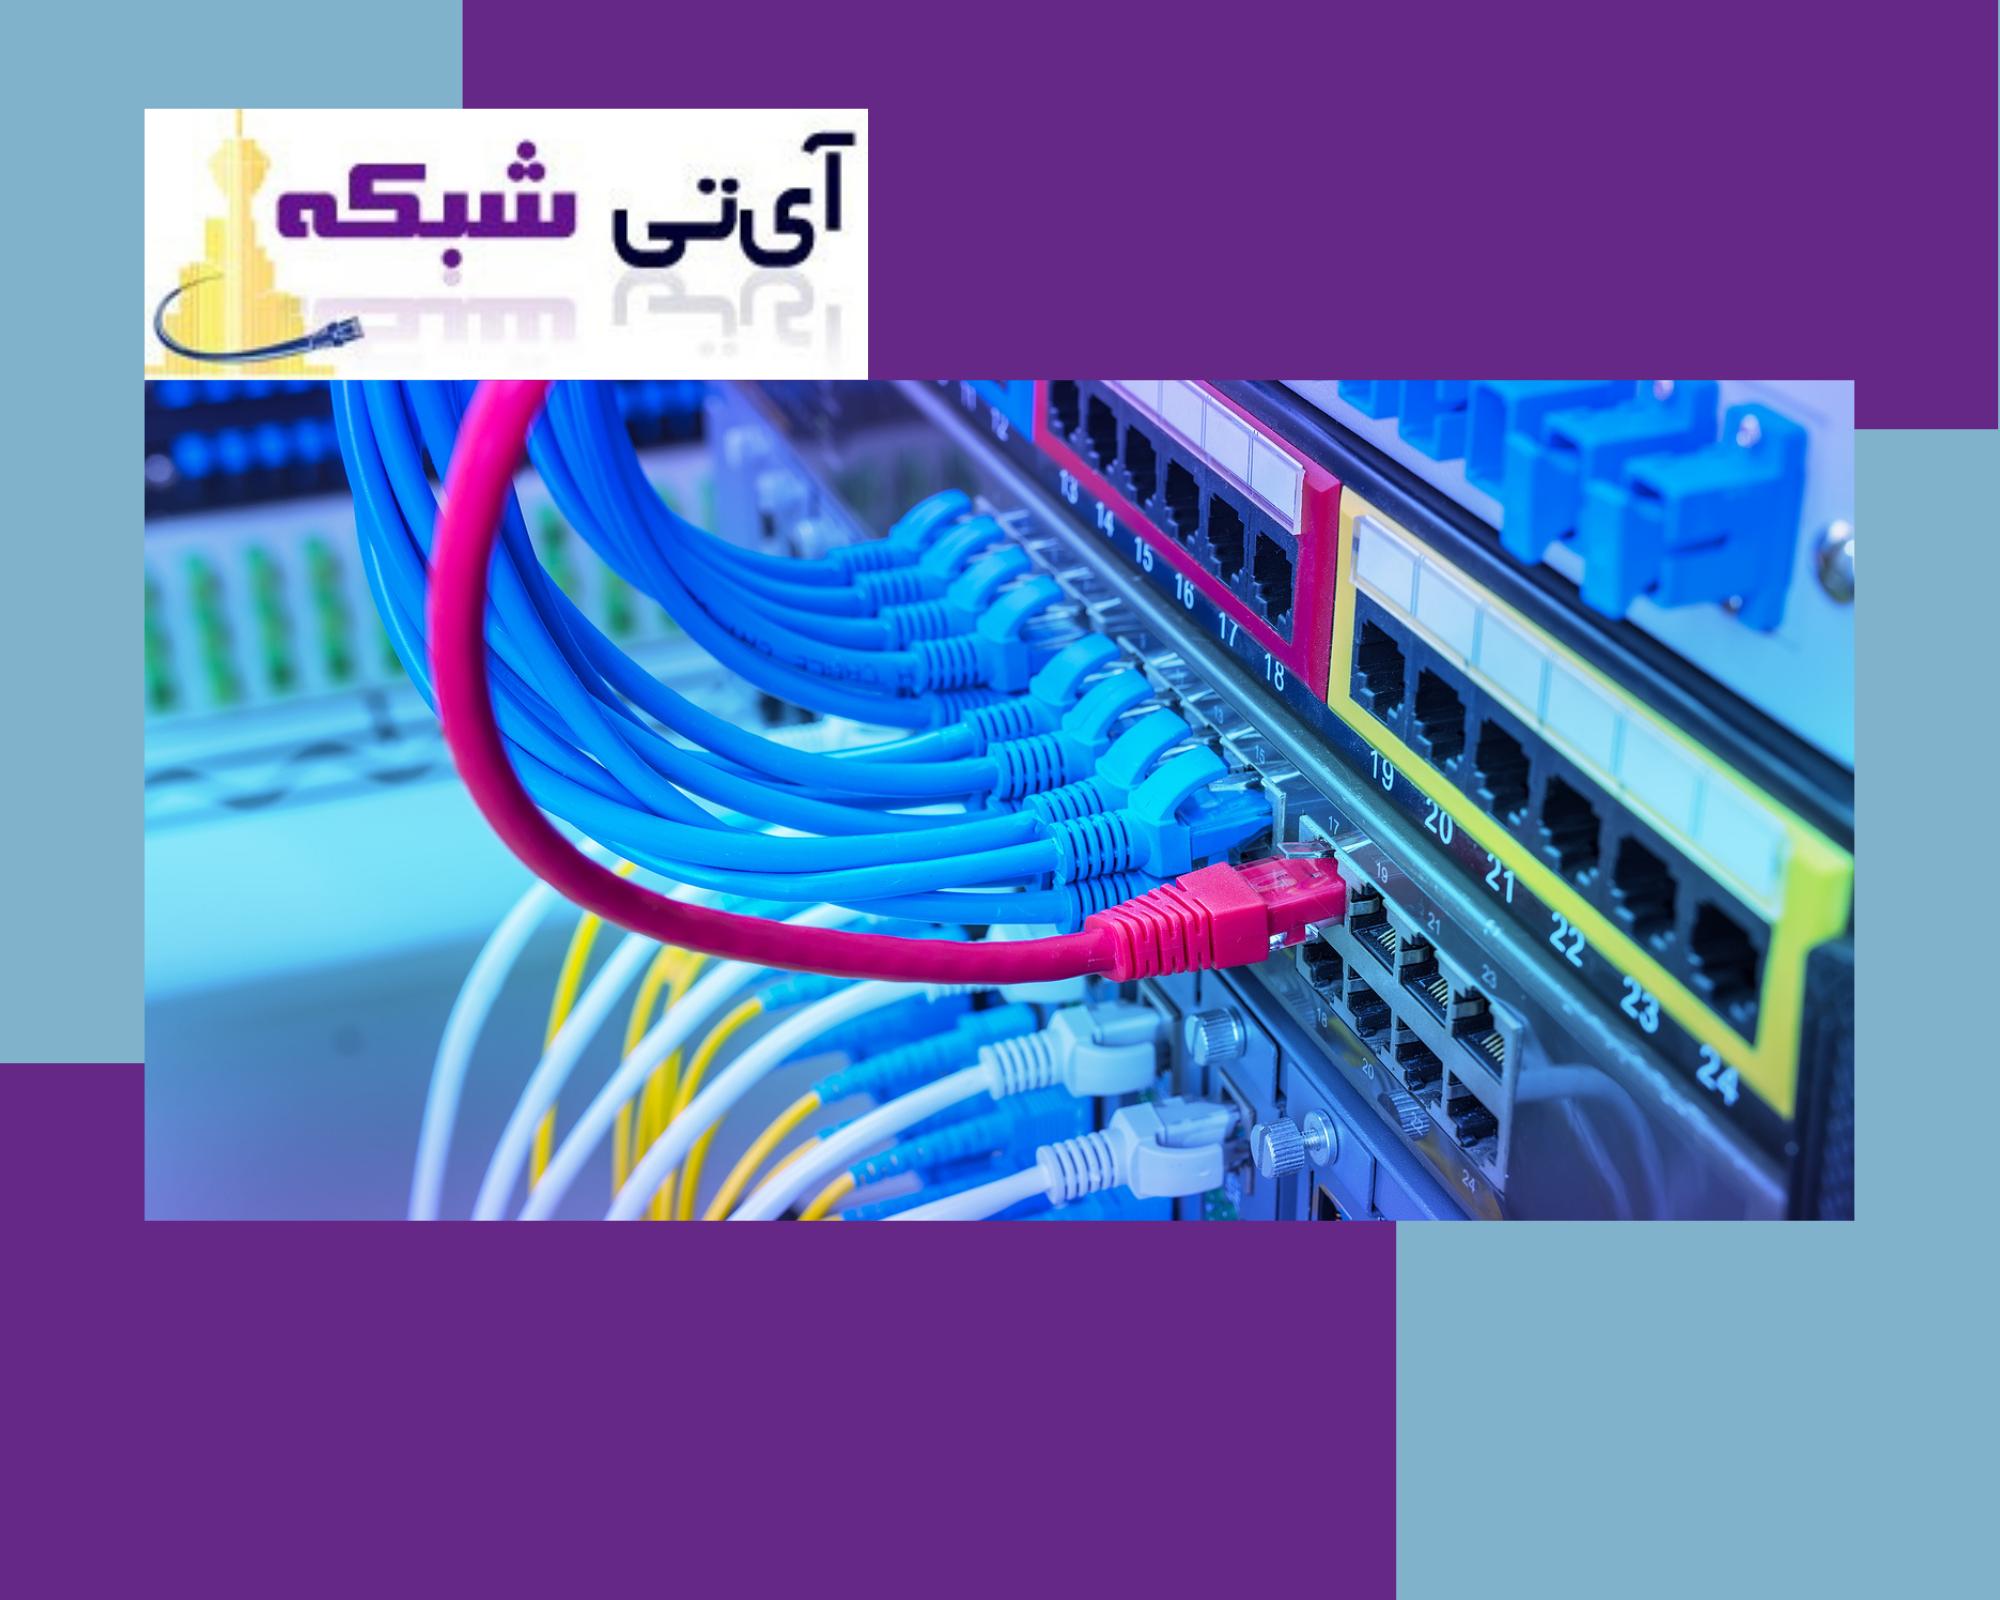 کابل - شبکه - ای - تی - شبکه